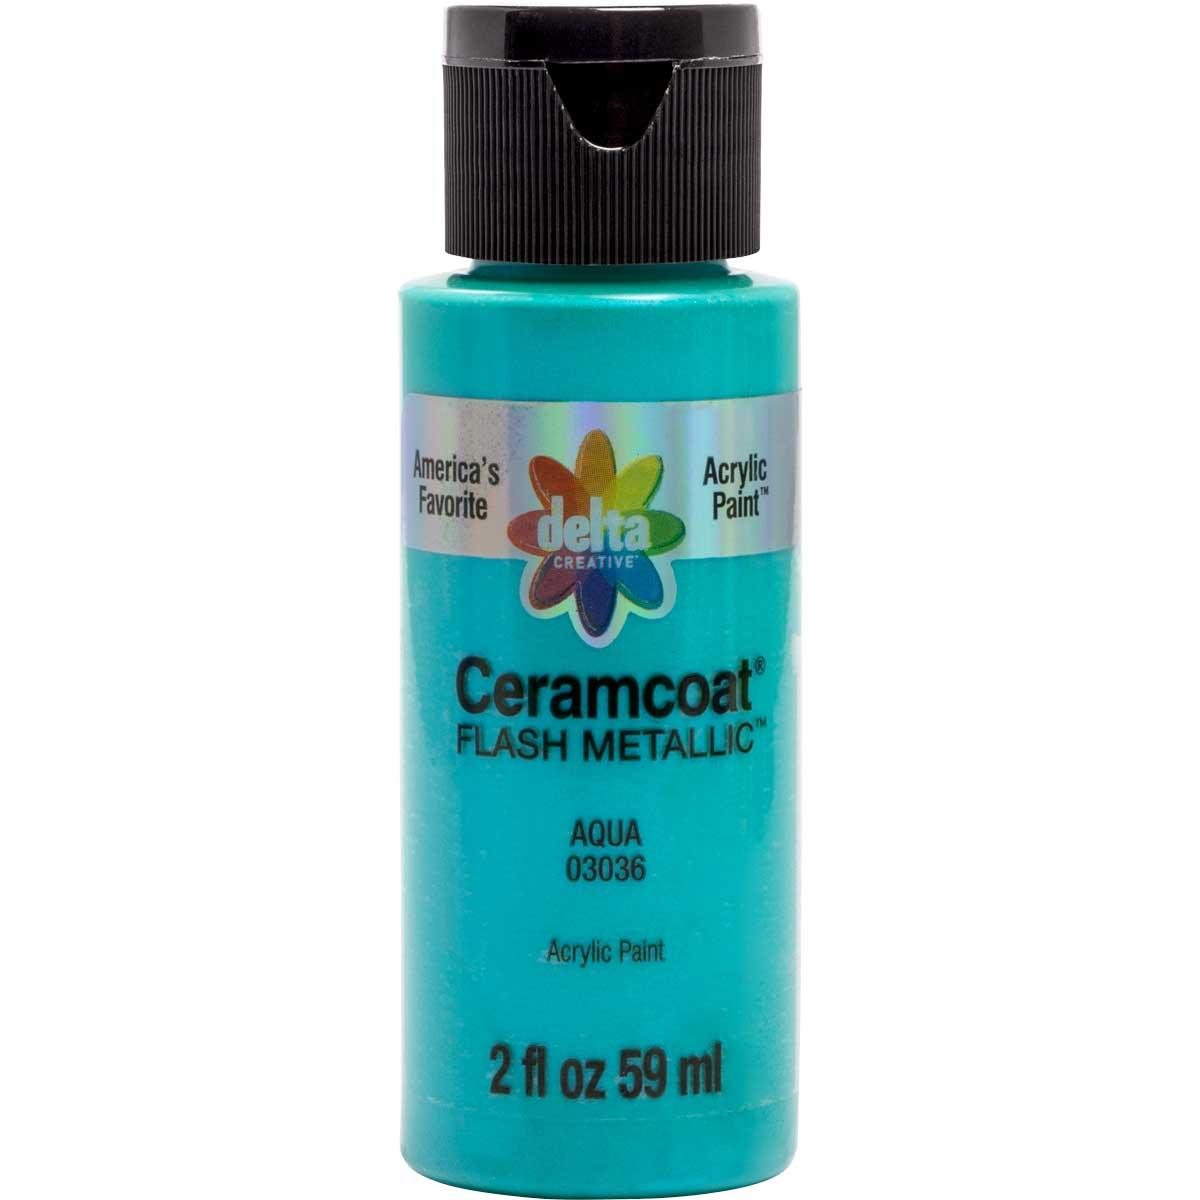 Delta Ceramcoat ® Acrylic Paint - Flash Metallic Aqua, 2 oz.